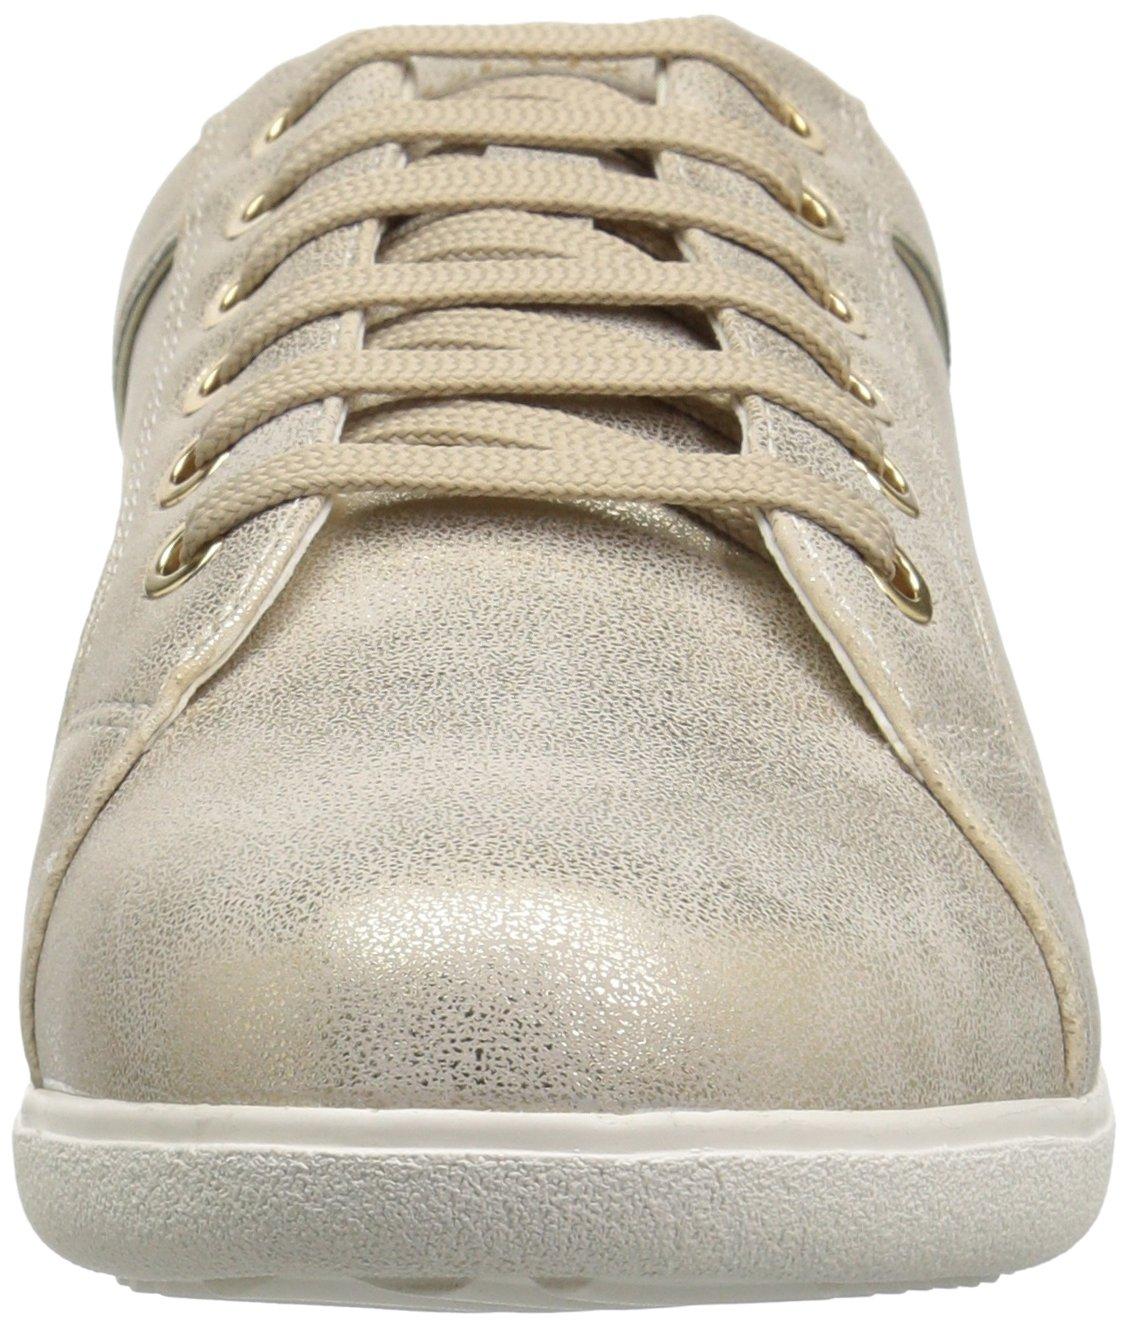 Geox Women's EU Nihal 5 Sneaker B073HV5W7C 40 M EU Women's (10 US)|Light Taupe/Beige 2f2c33